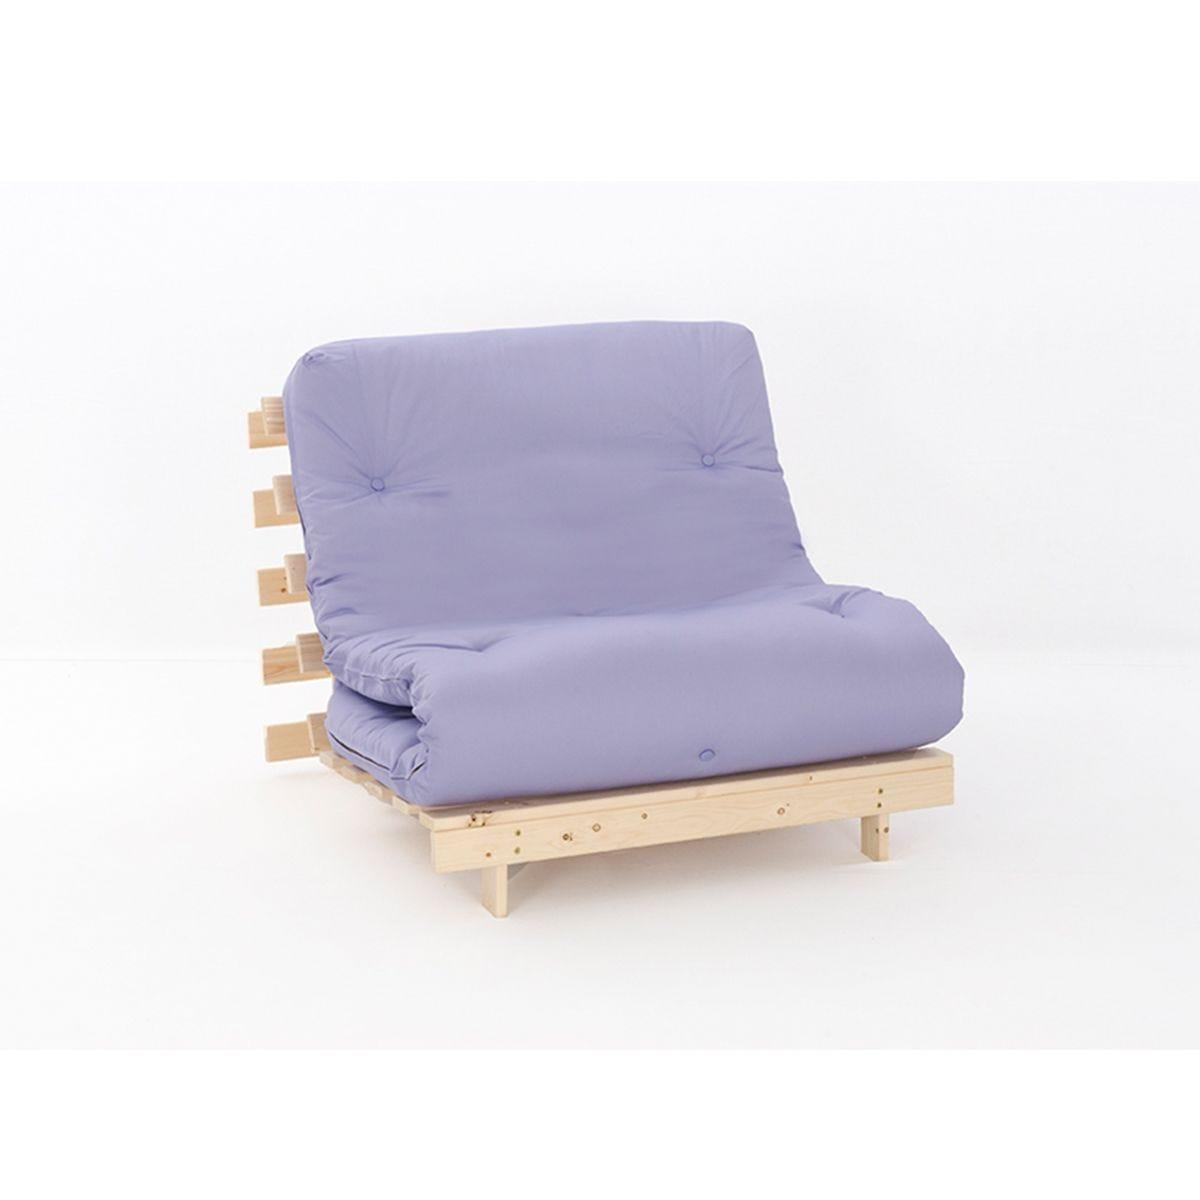 Ayr Futon Set With Tufted Mattress - Lilac